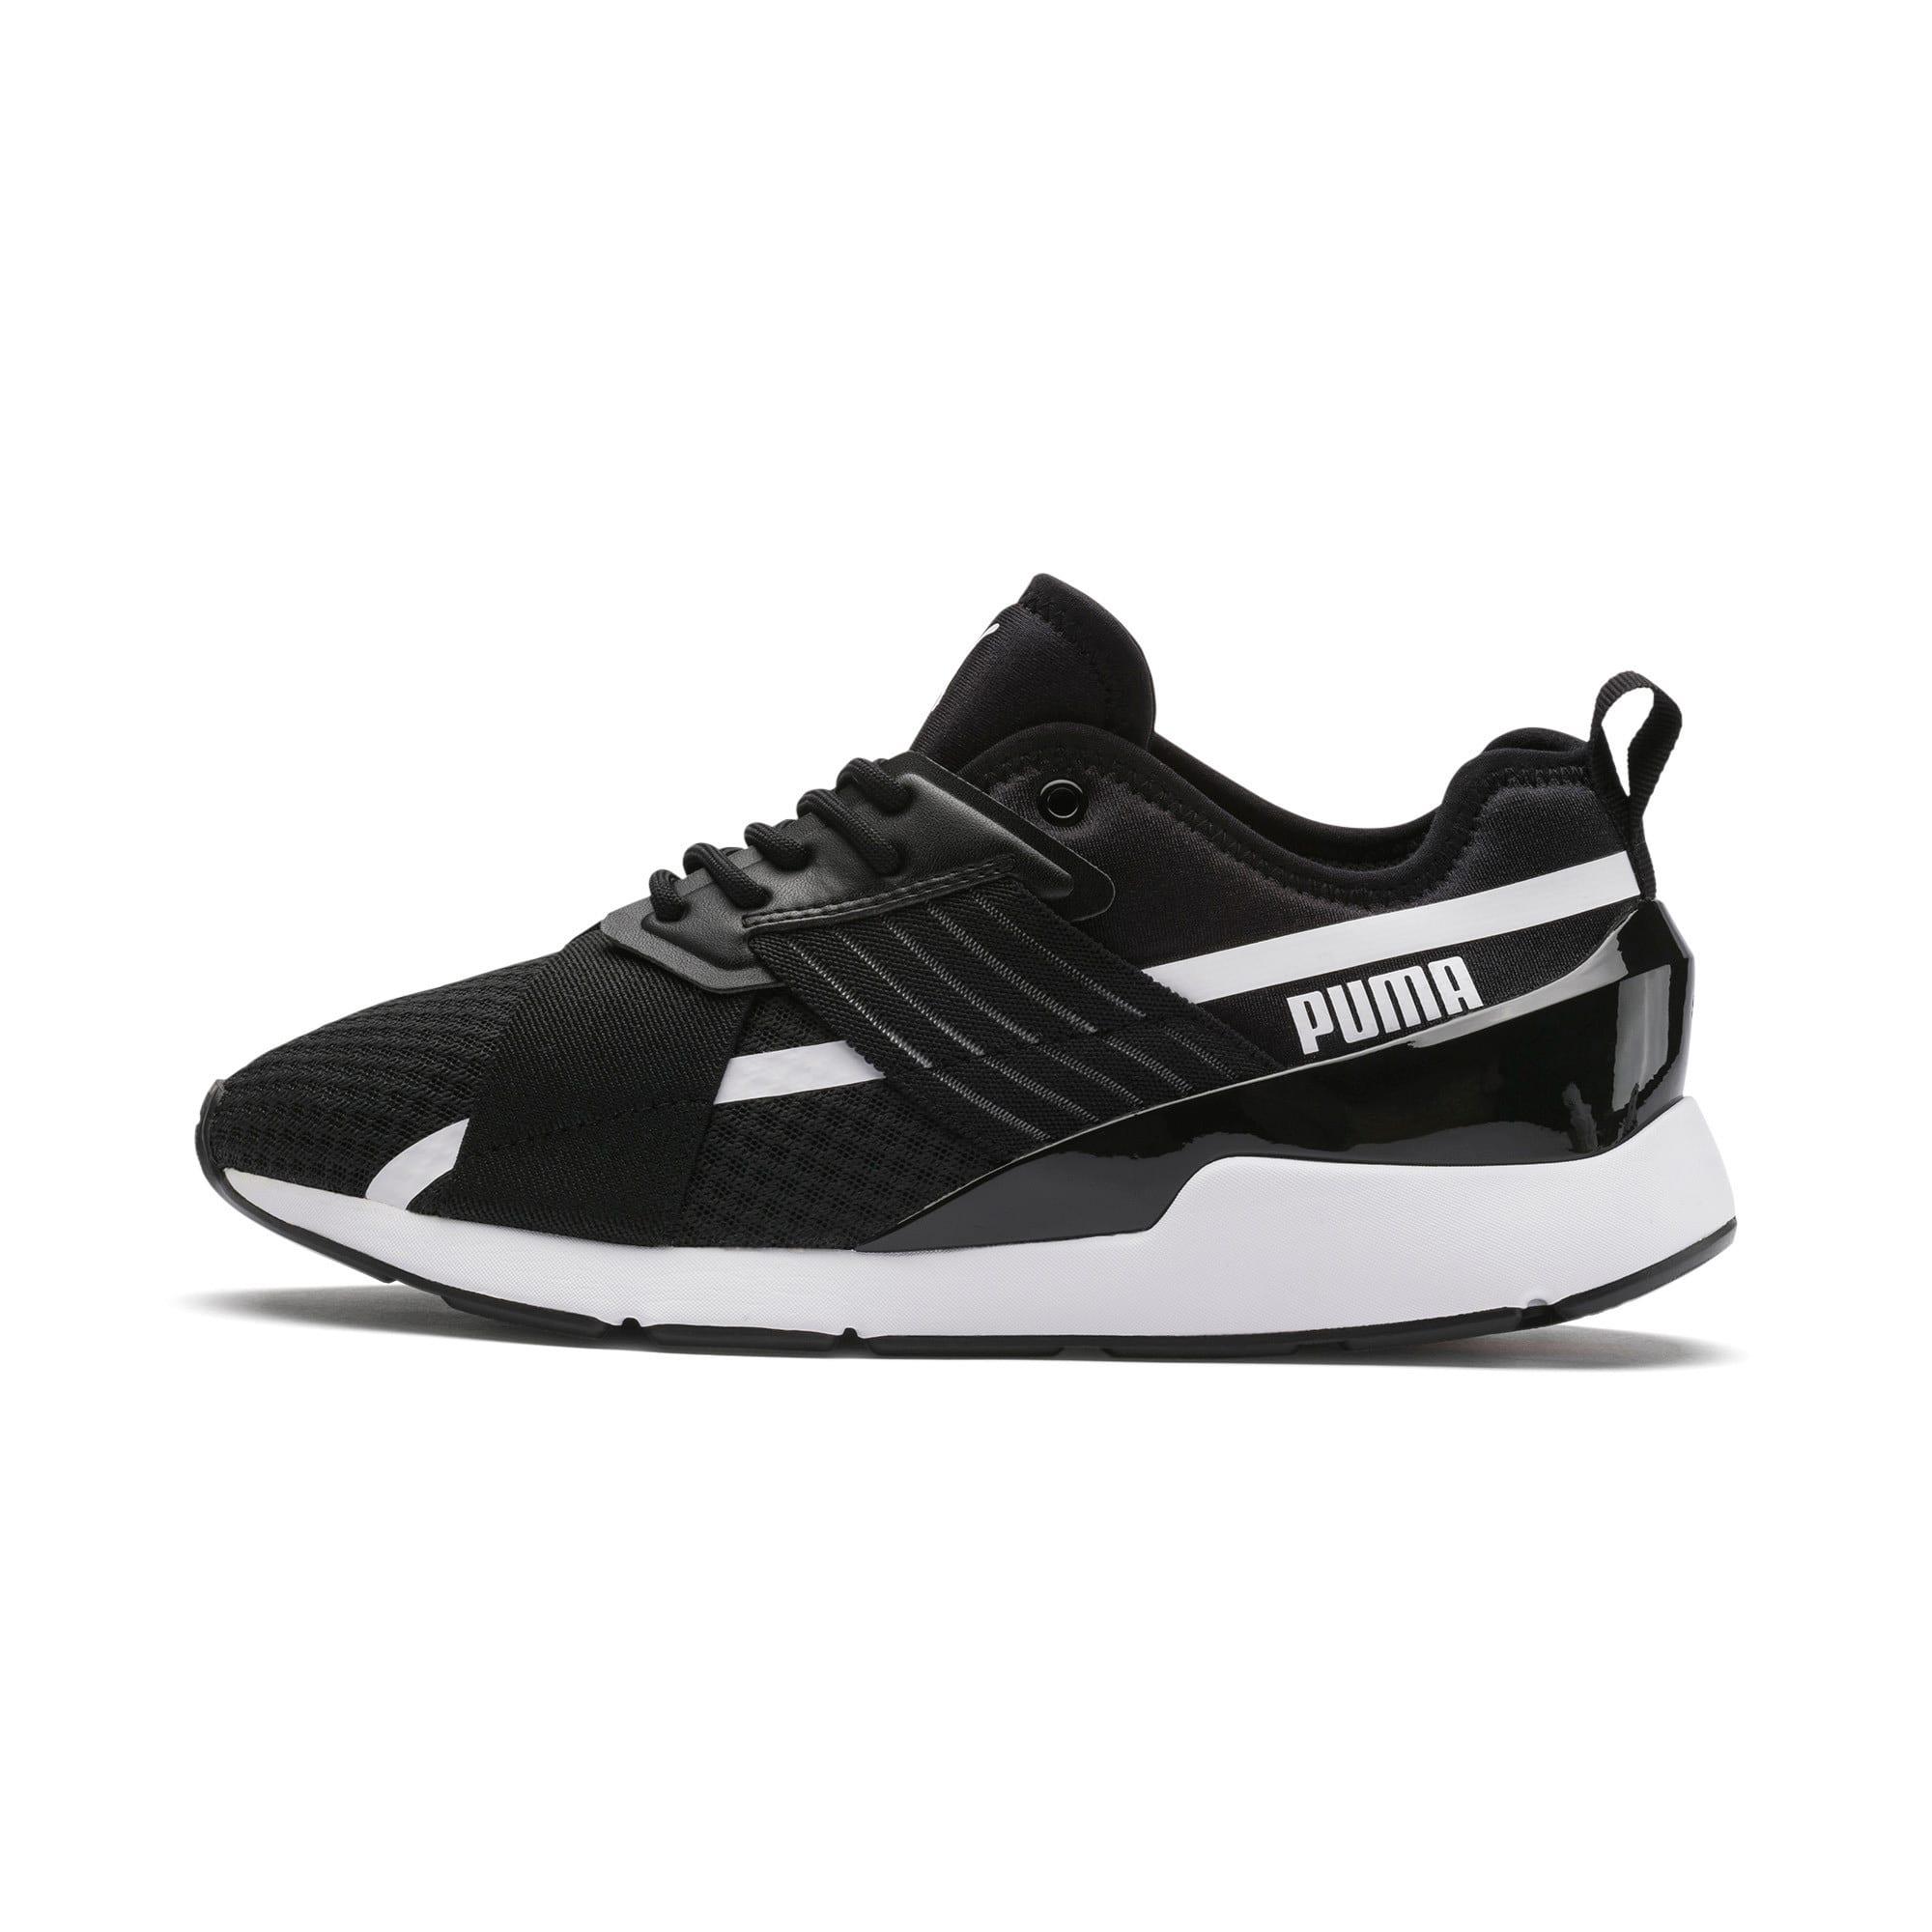 Thumbnail 1 of Muse X-2 Women's Sneakers, Puma Black-Puma White, medium